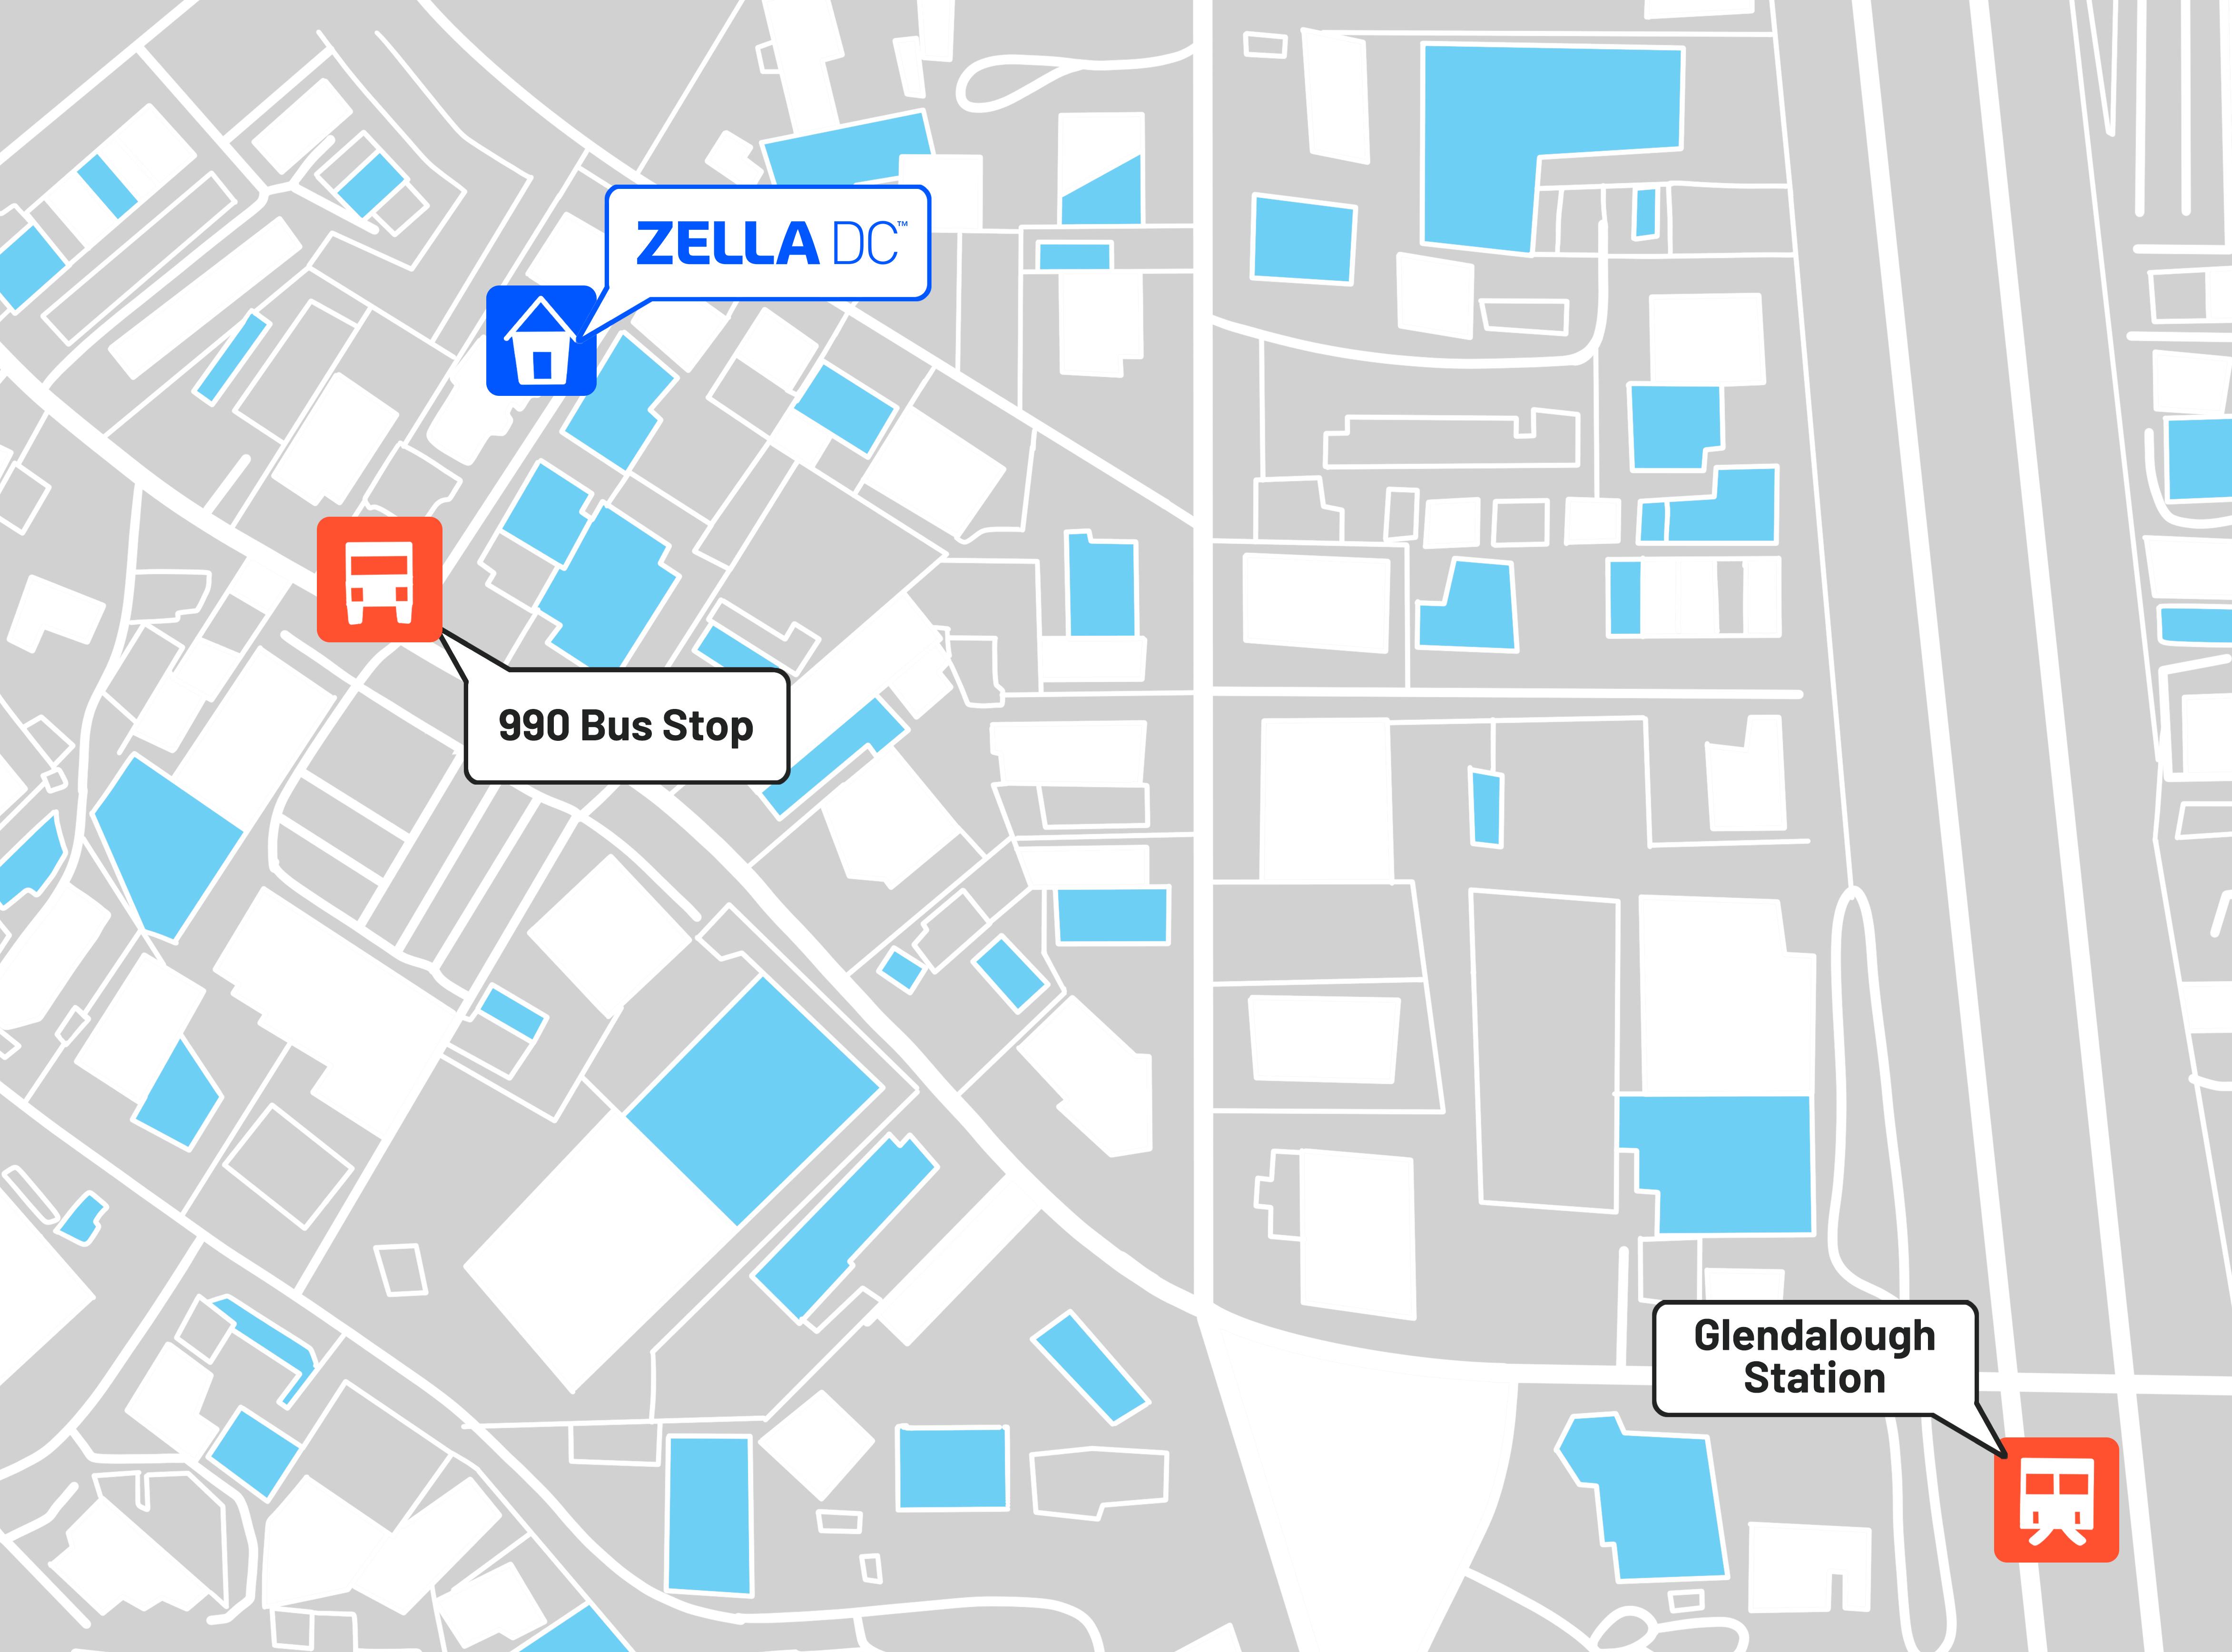 Zella DC_Location Map | Zella DC | Micro Data Center | Zella DC Location | Zella DC